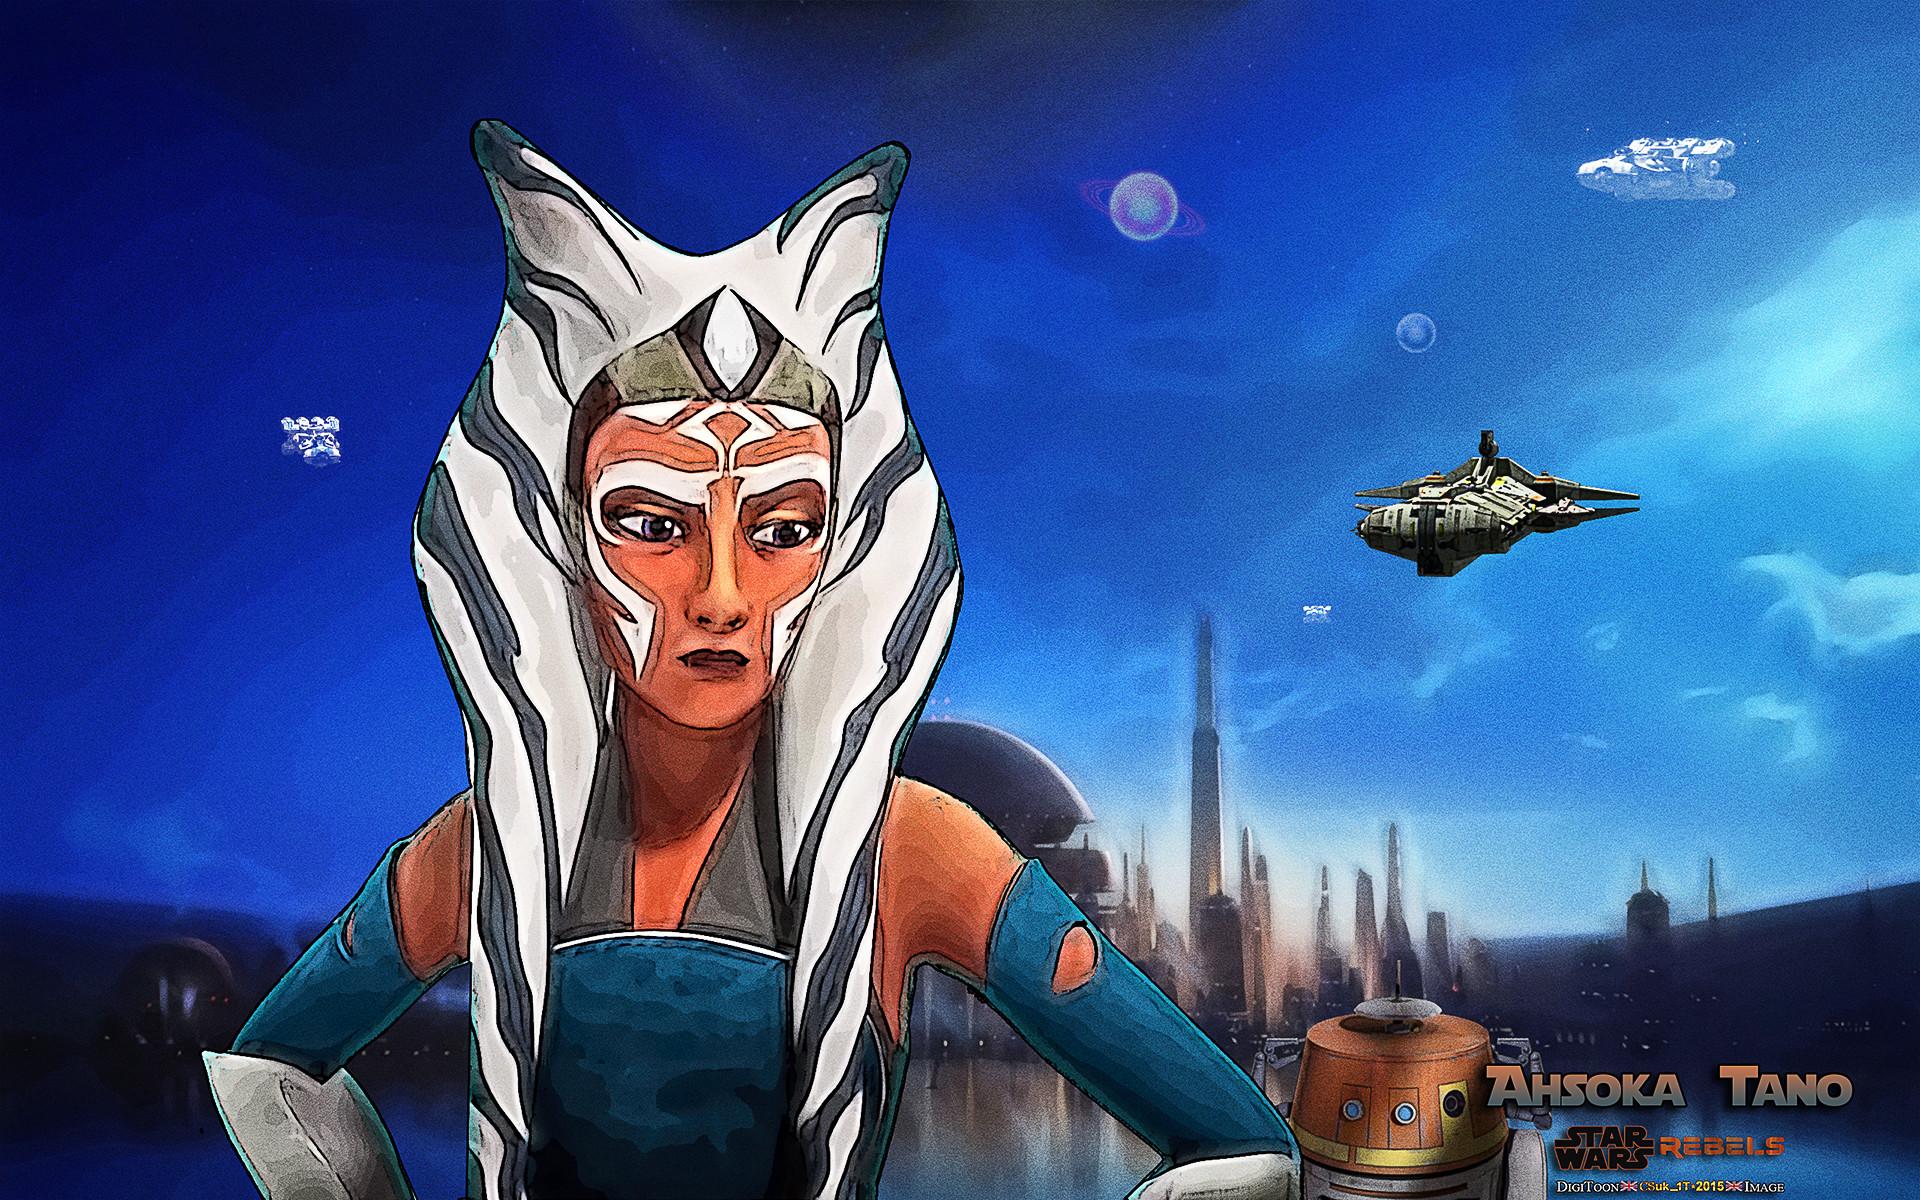 … STAR WARS REBELS FANART: AHSOKA TANO and CHOPPER by CSuk-1T